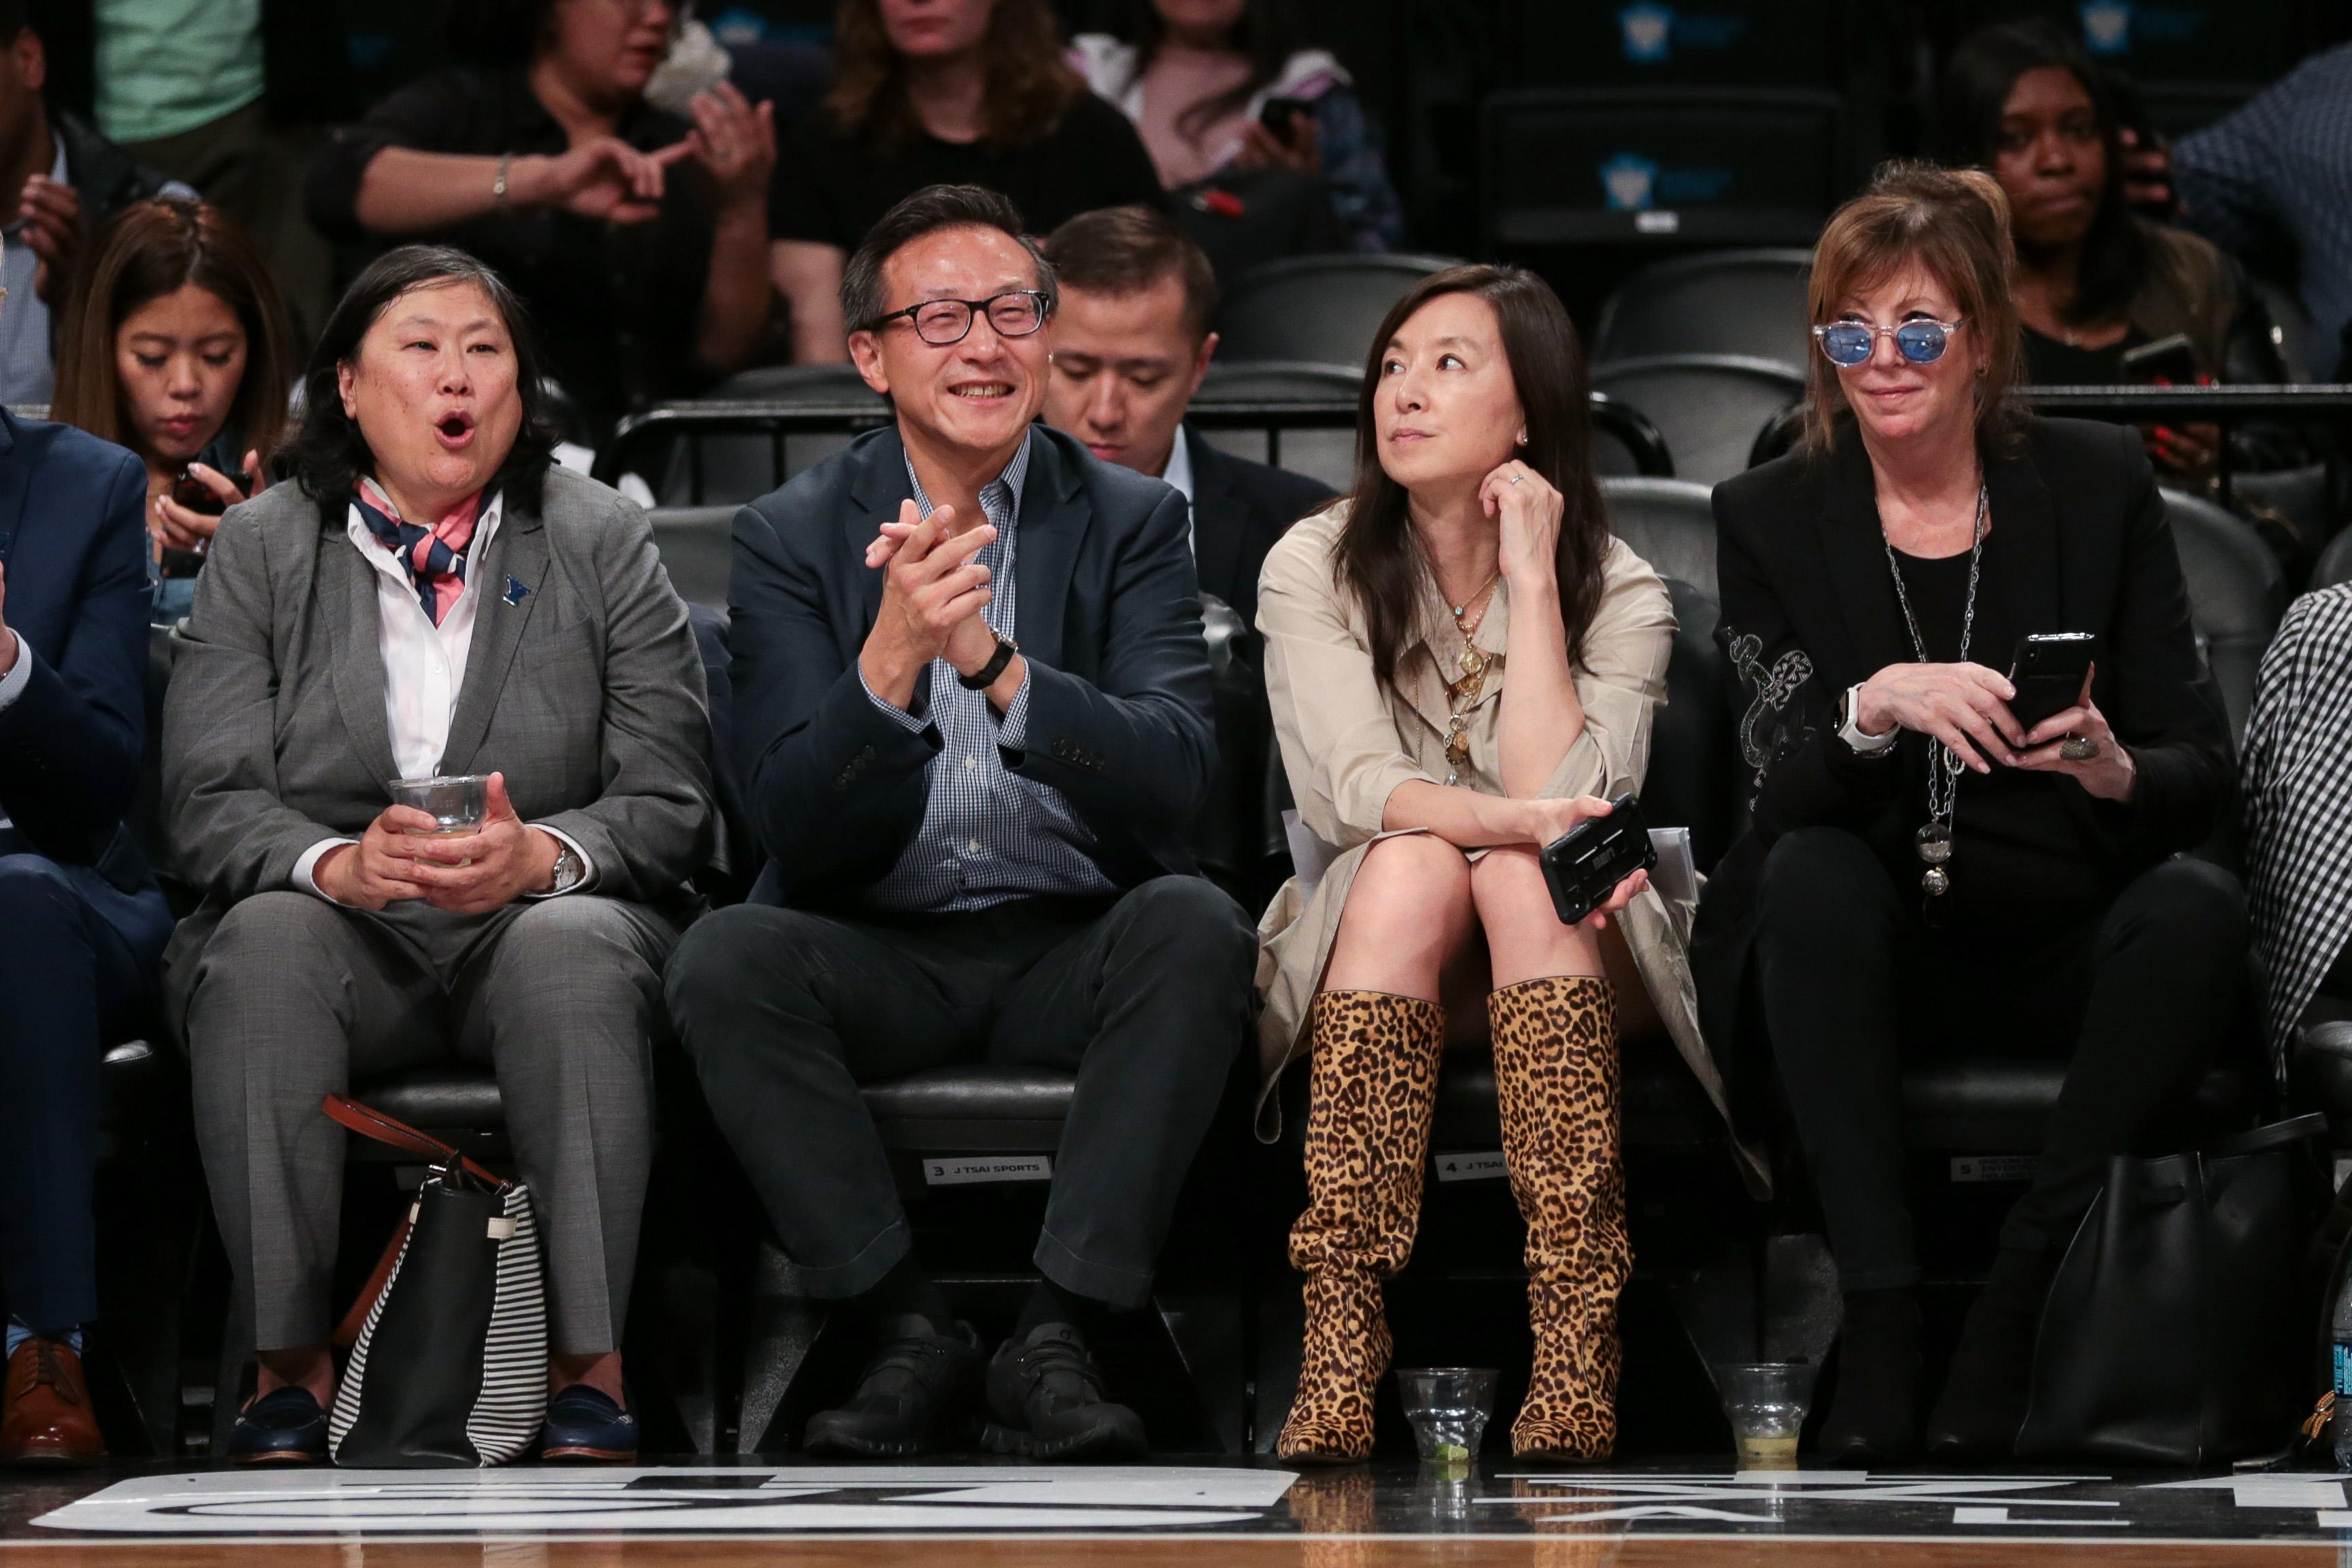 Alibaba exec Joe Tsai buying Brooklyn Nets could usher in era of foreign money in U.S. sports